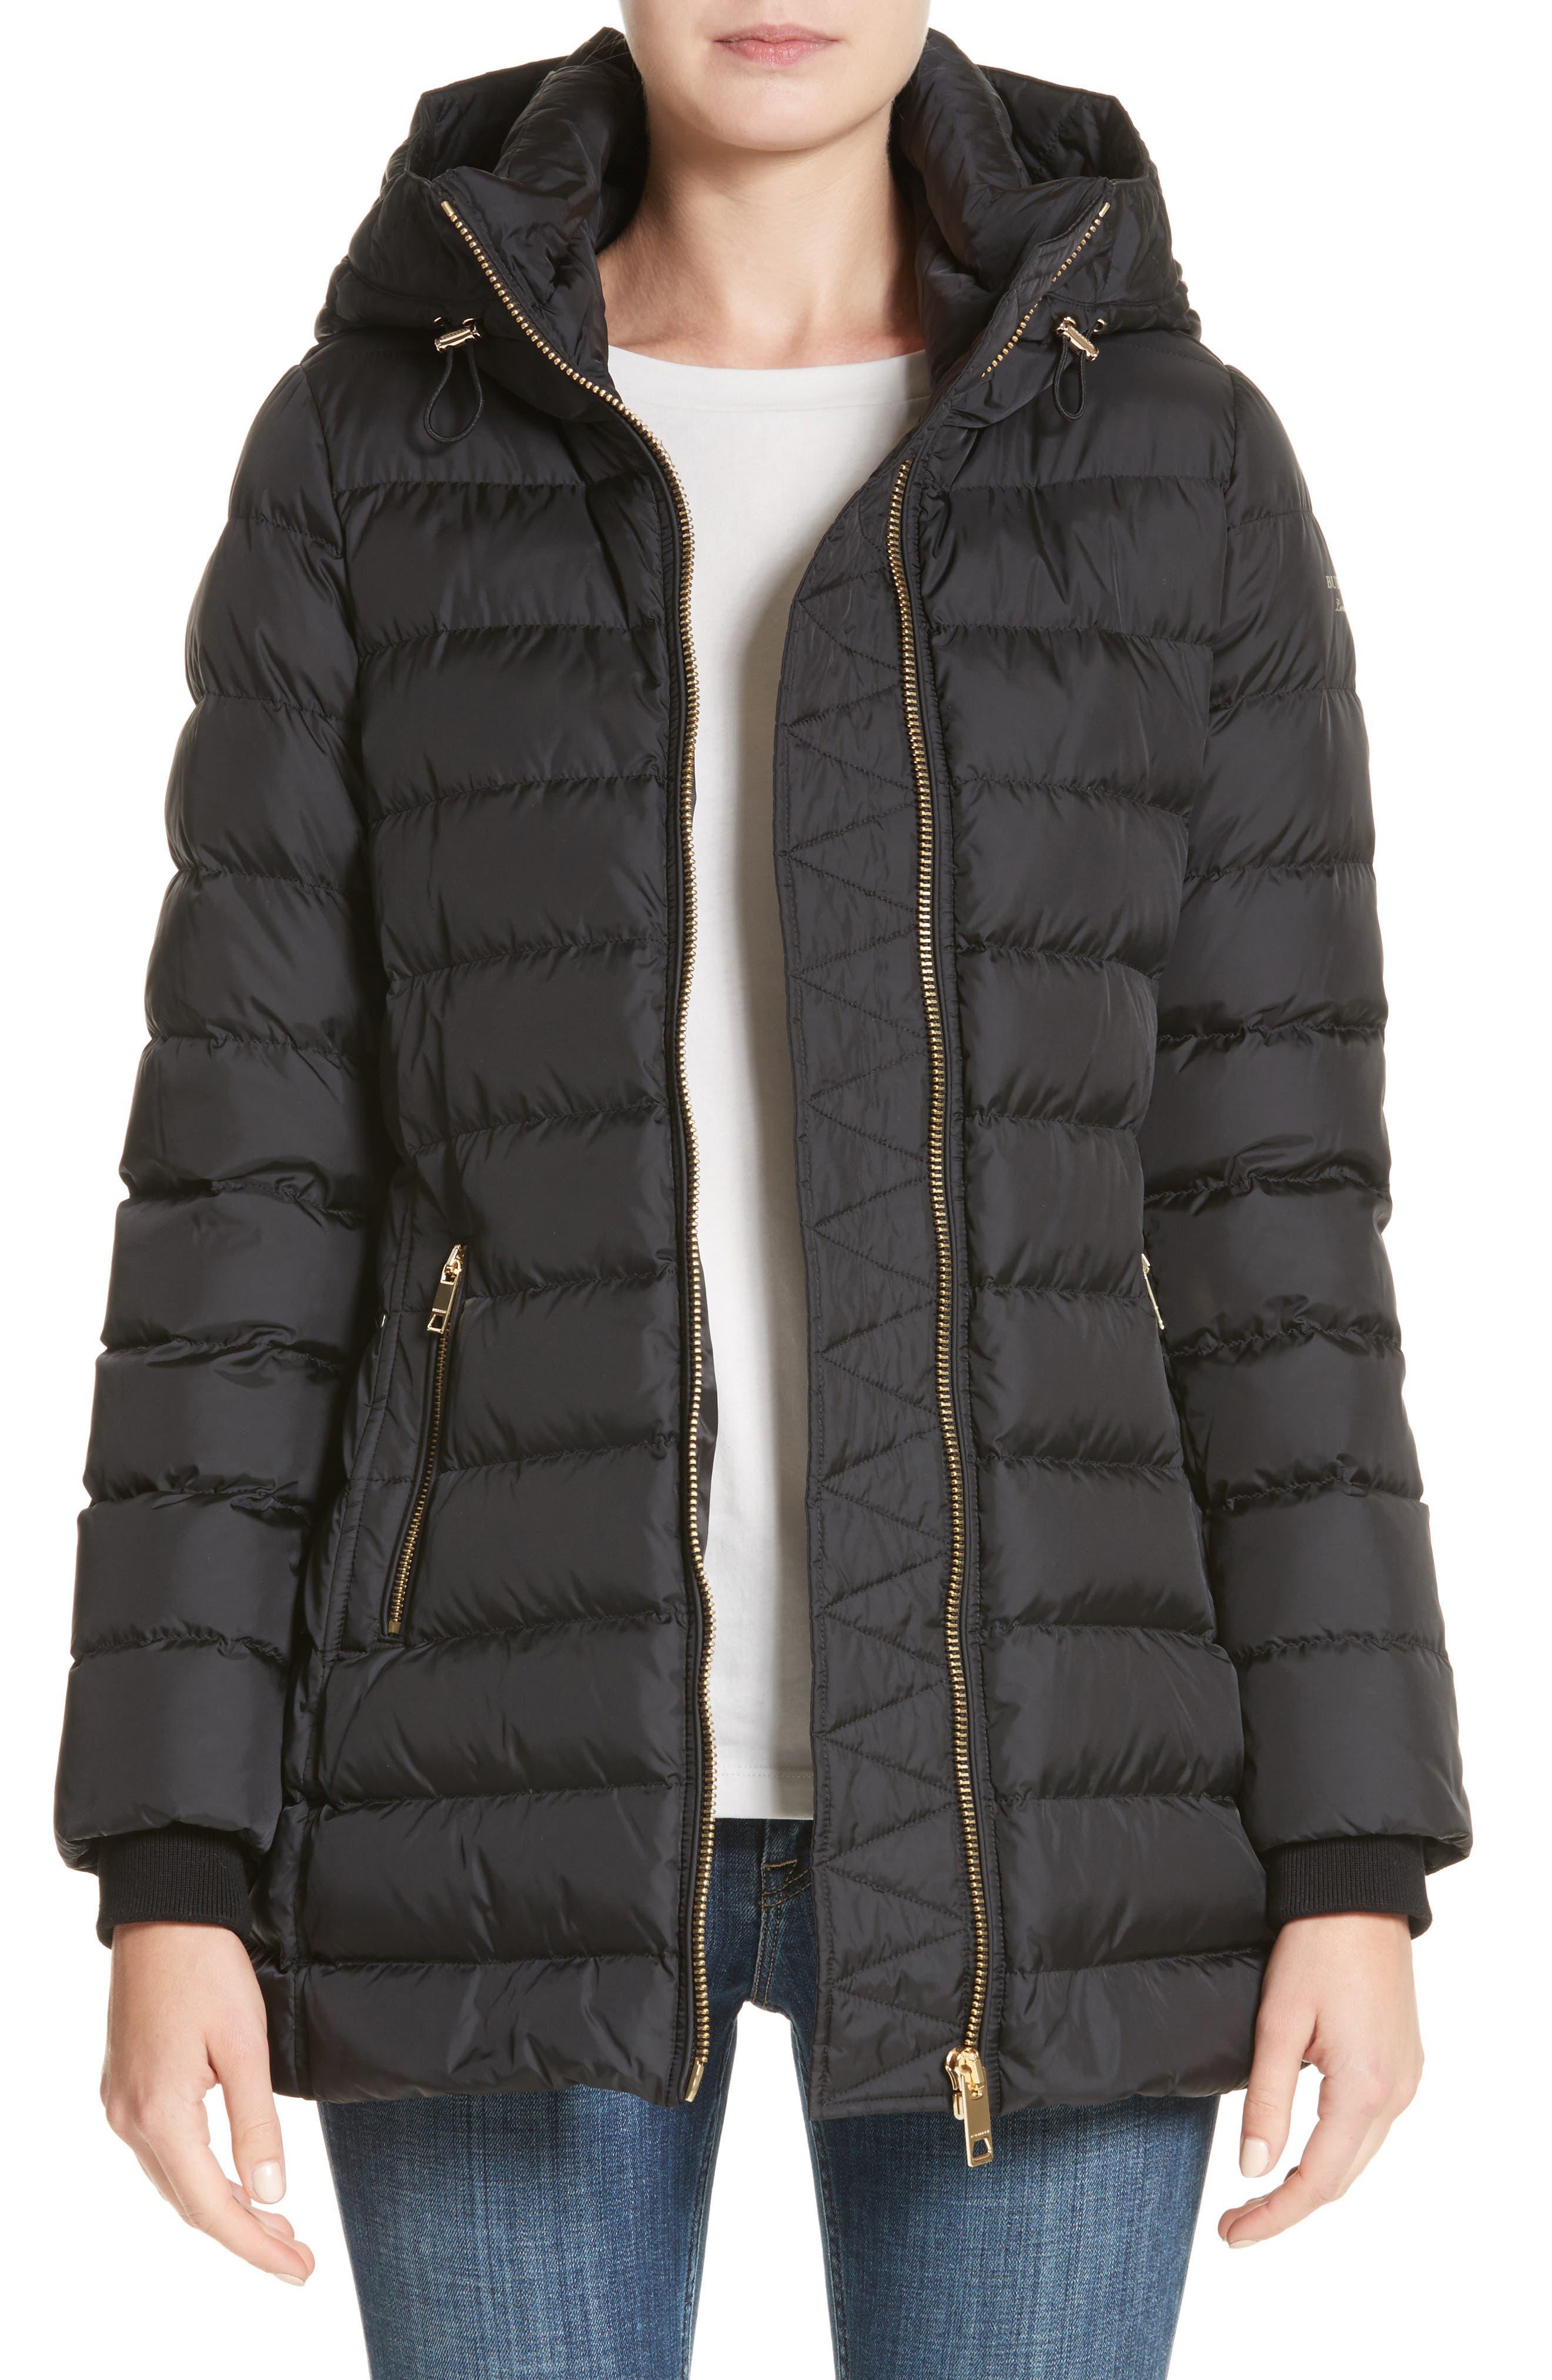 Limefield Hooded Puffer Coat,                             Main thumbnail 1, color,                             Black